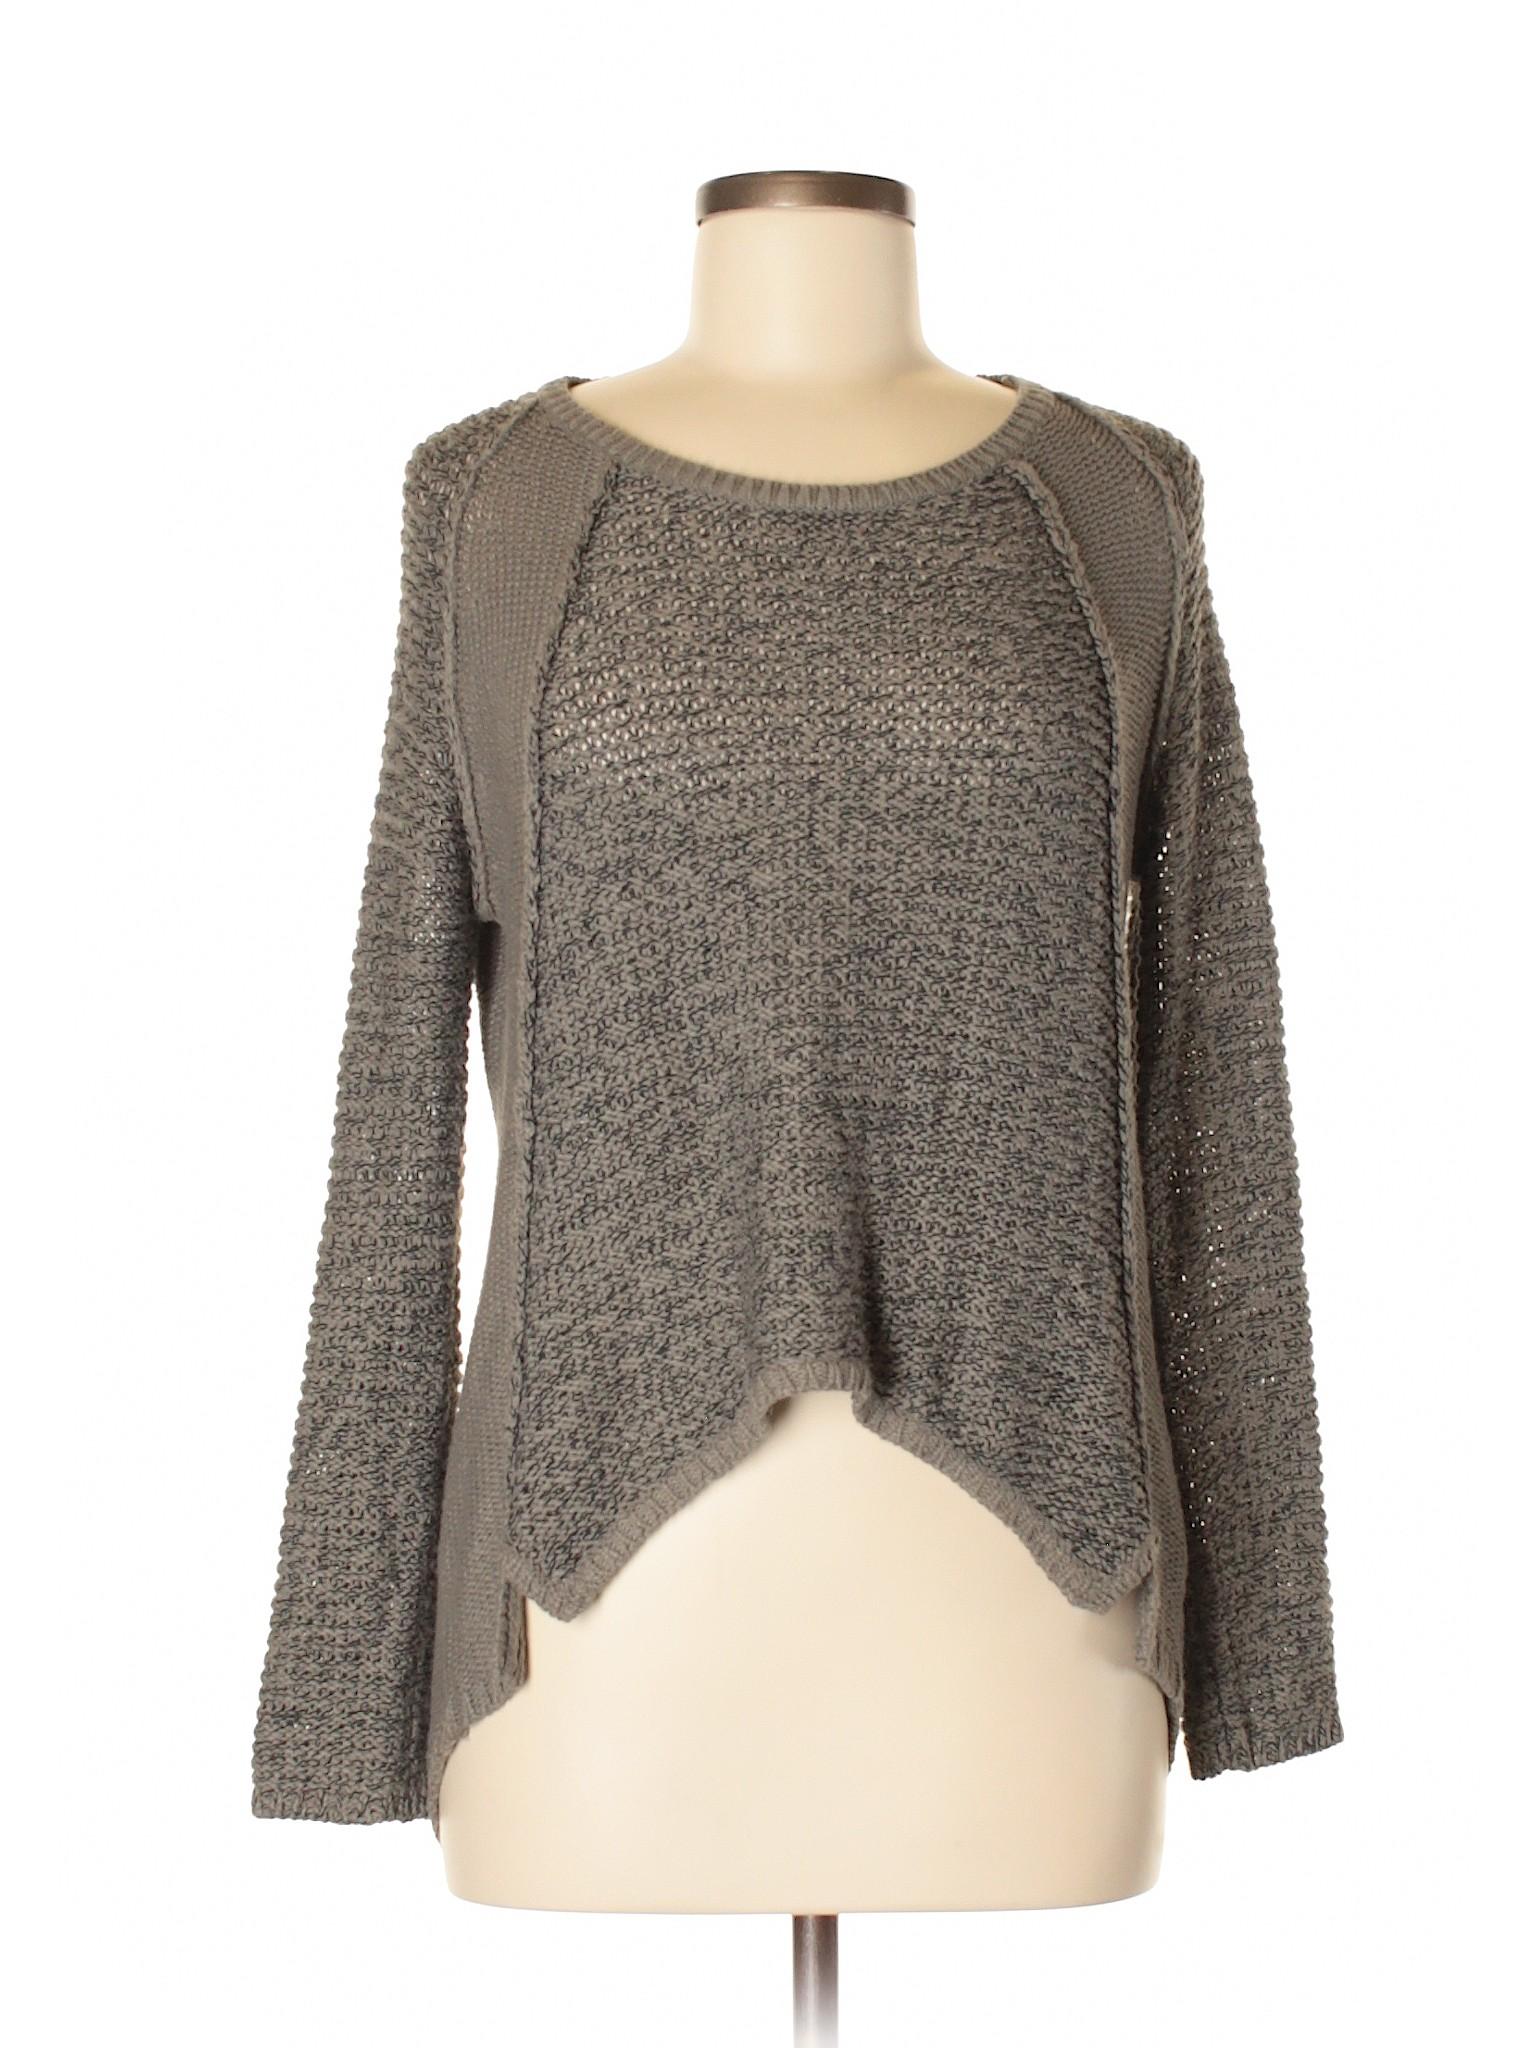 Boutique RDI Pullover RDI Sweater Pullover Sweater Boutique wn0U8x8F4q